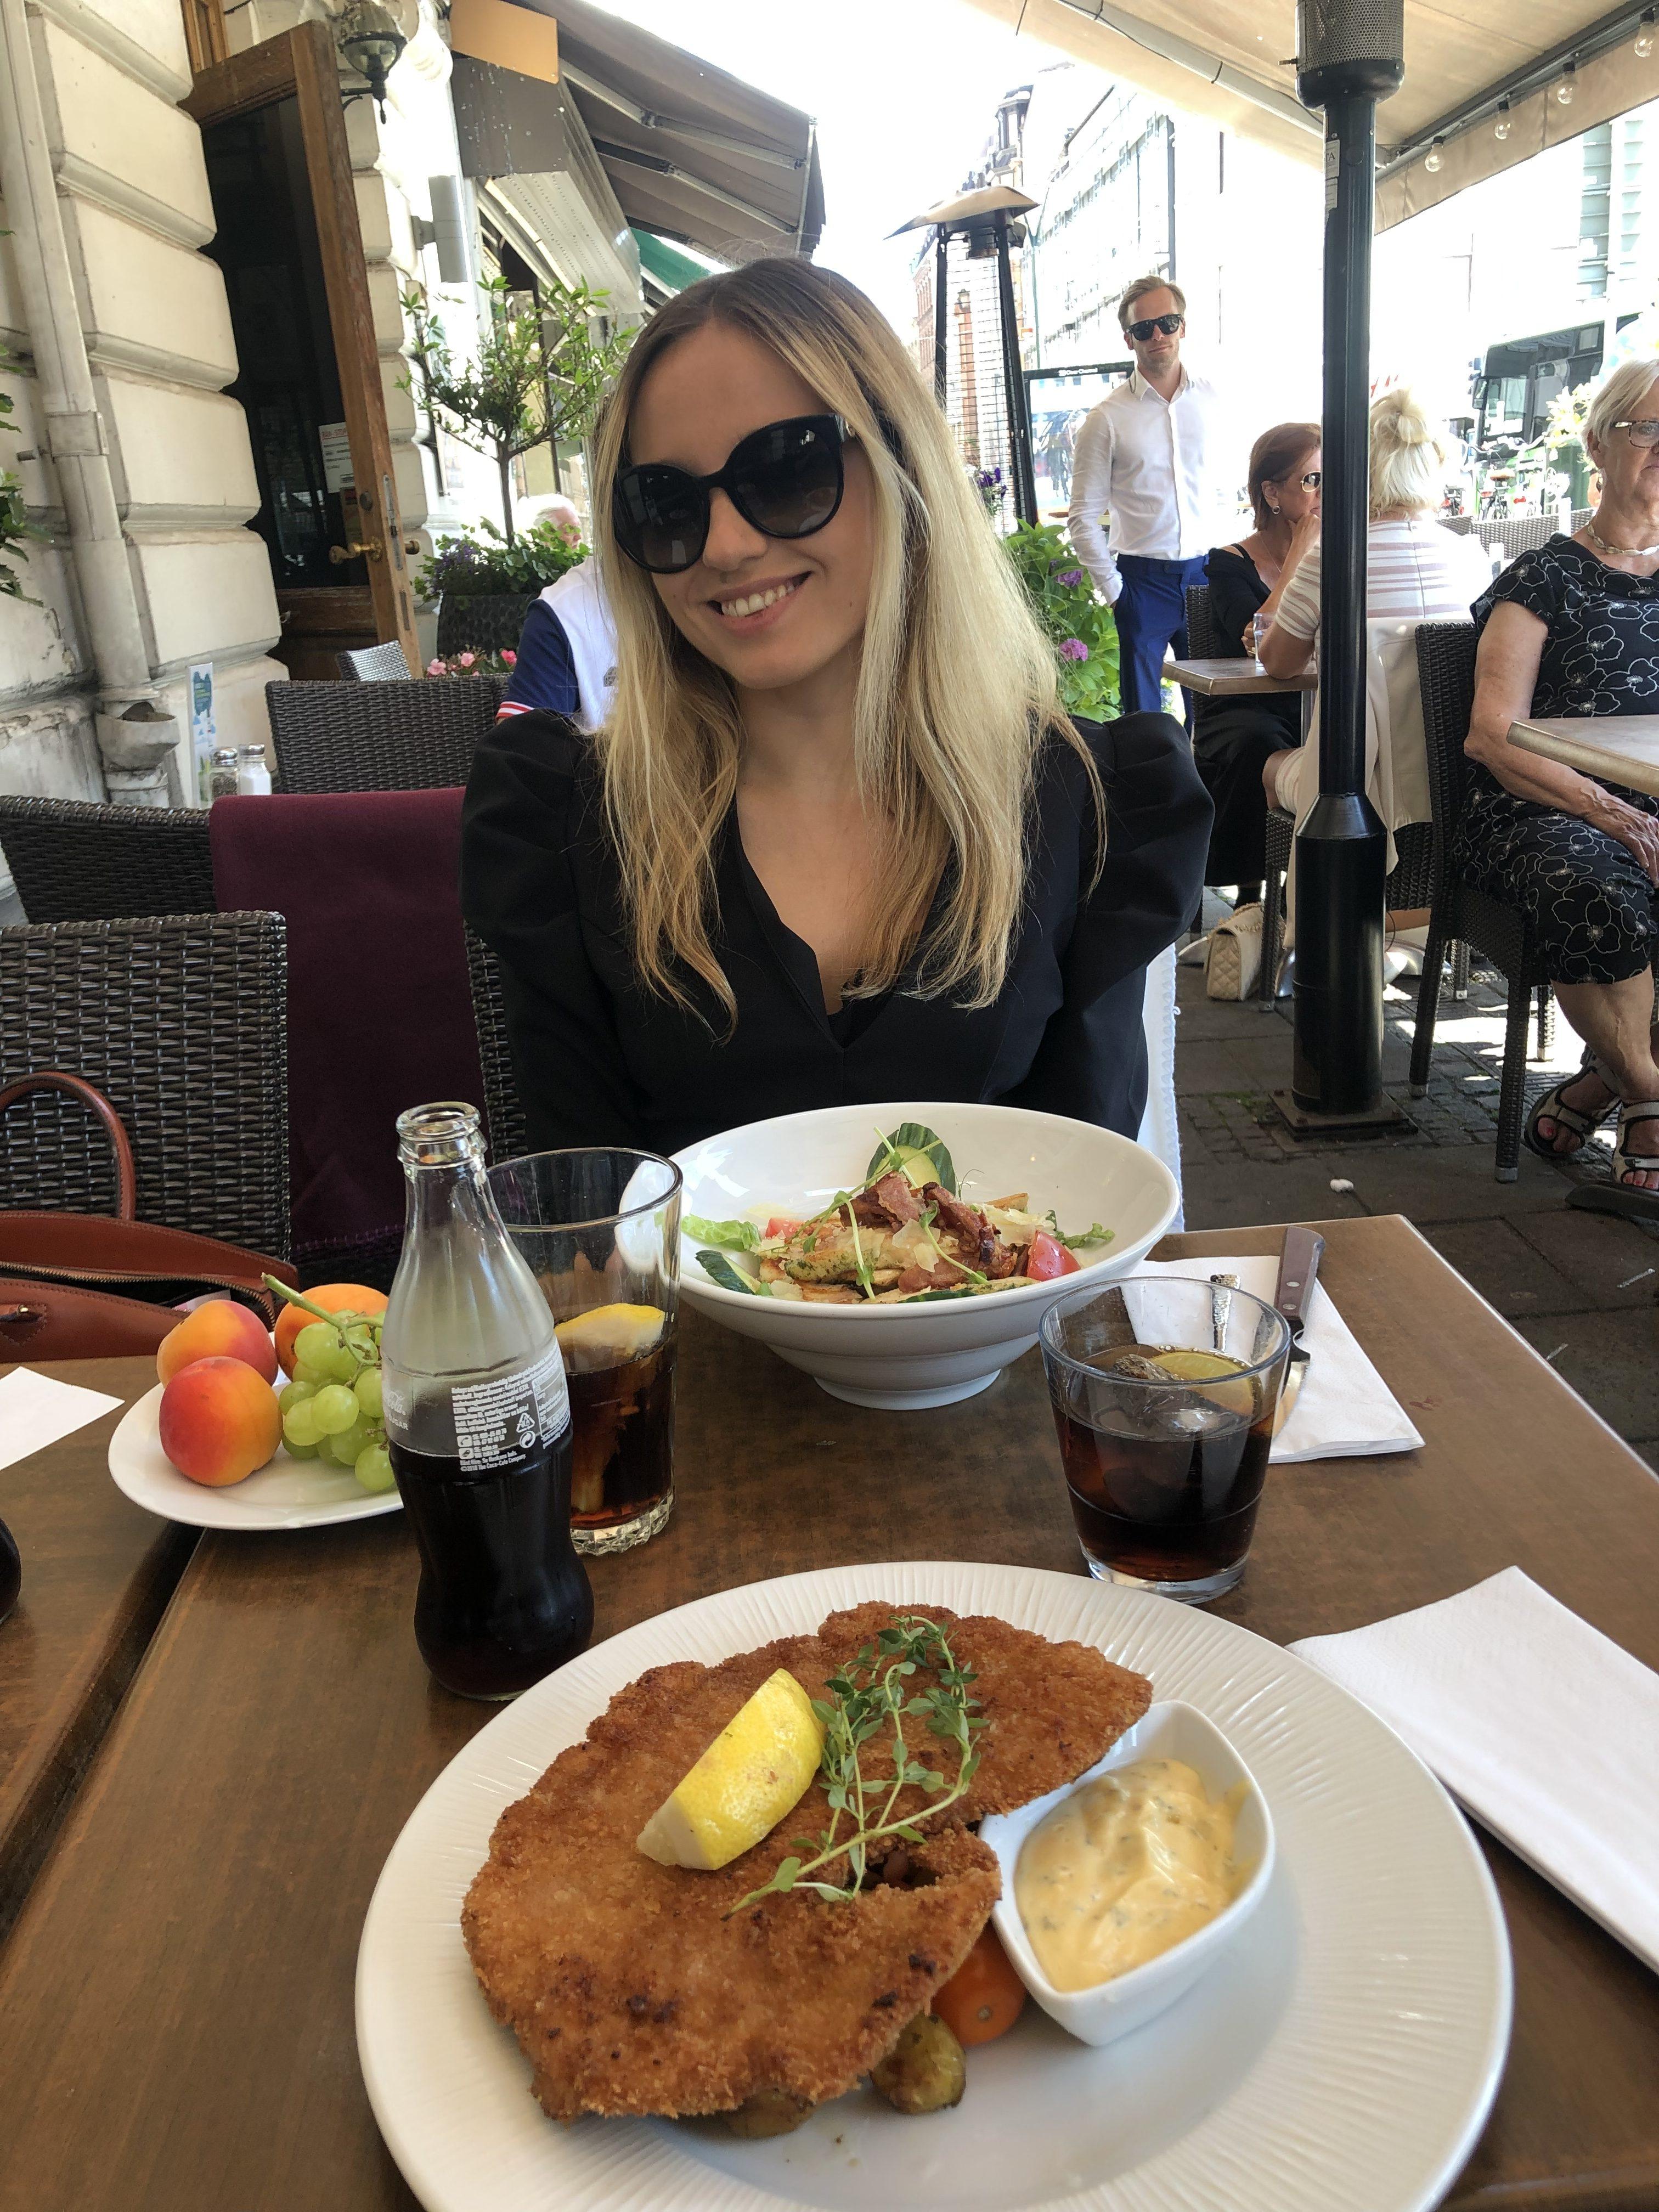 Lunchdejt, måndagsblommor & helt underbart